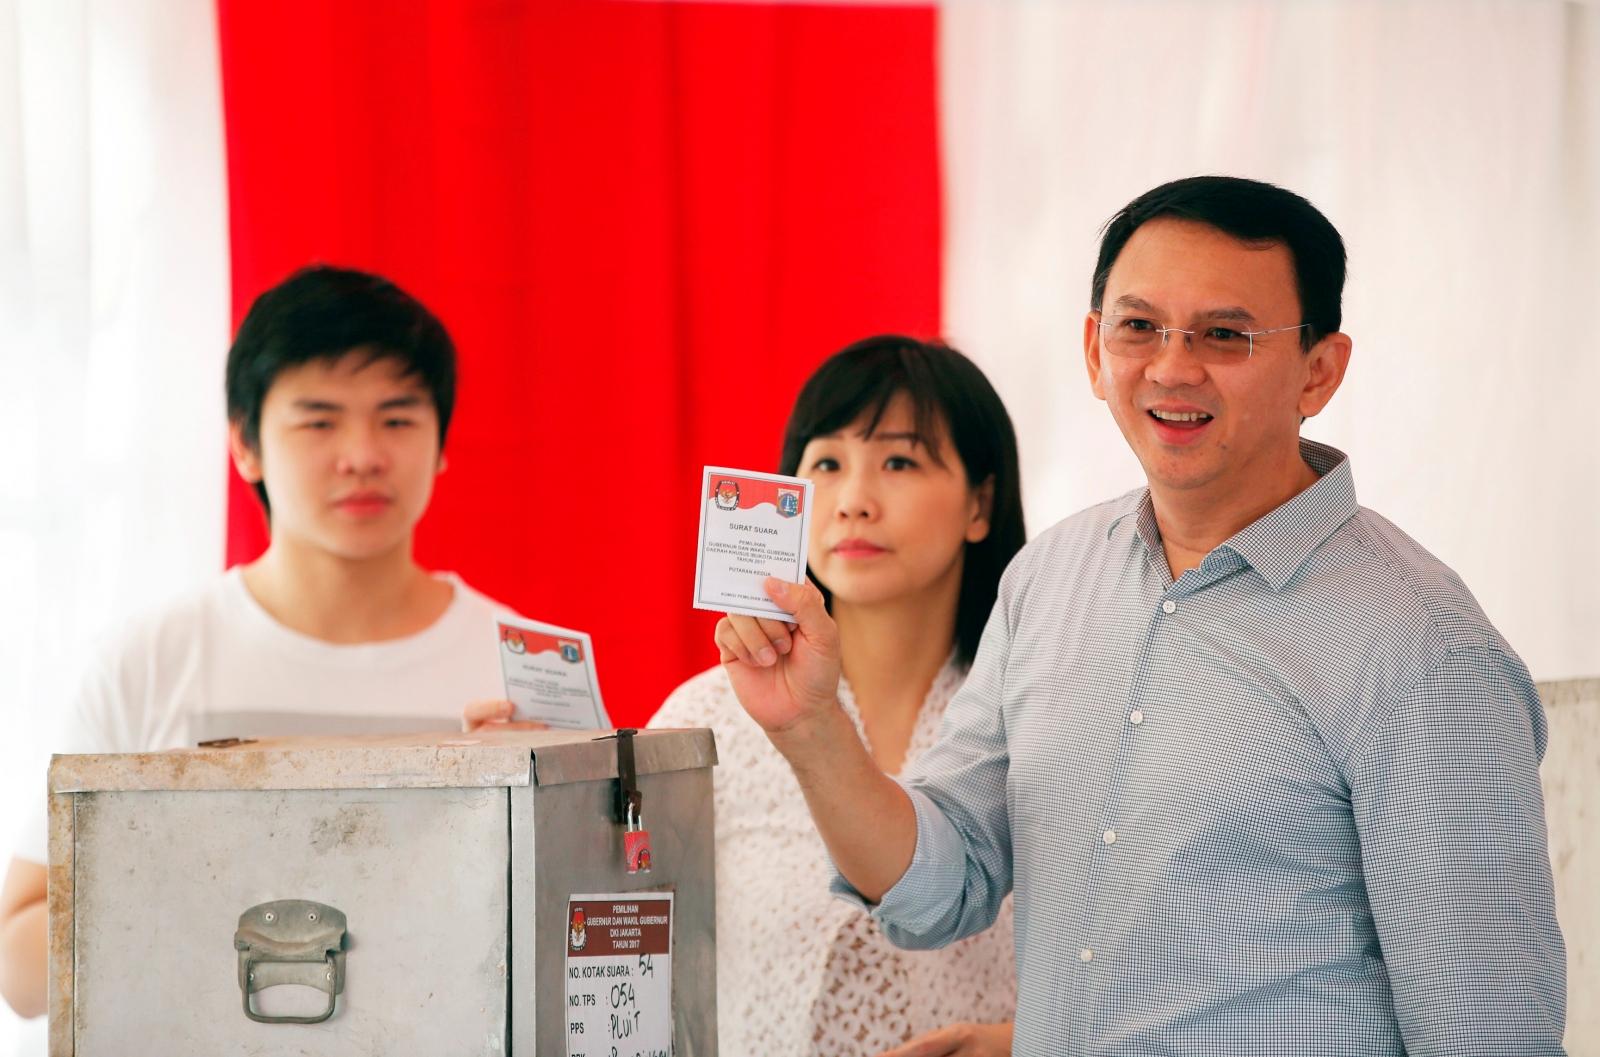 Jakarta elections